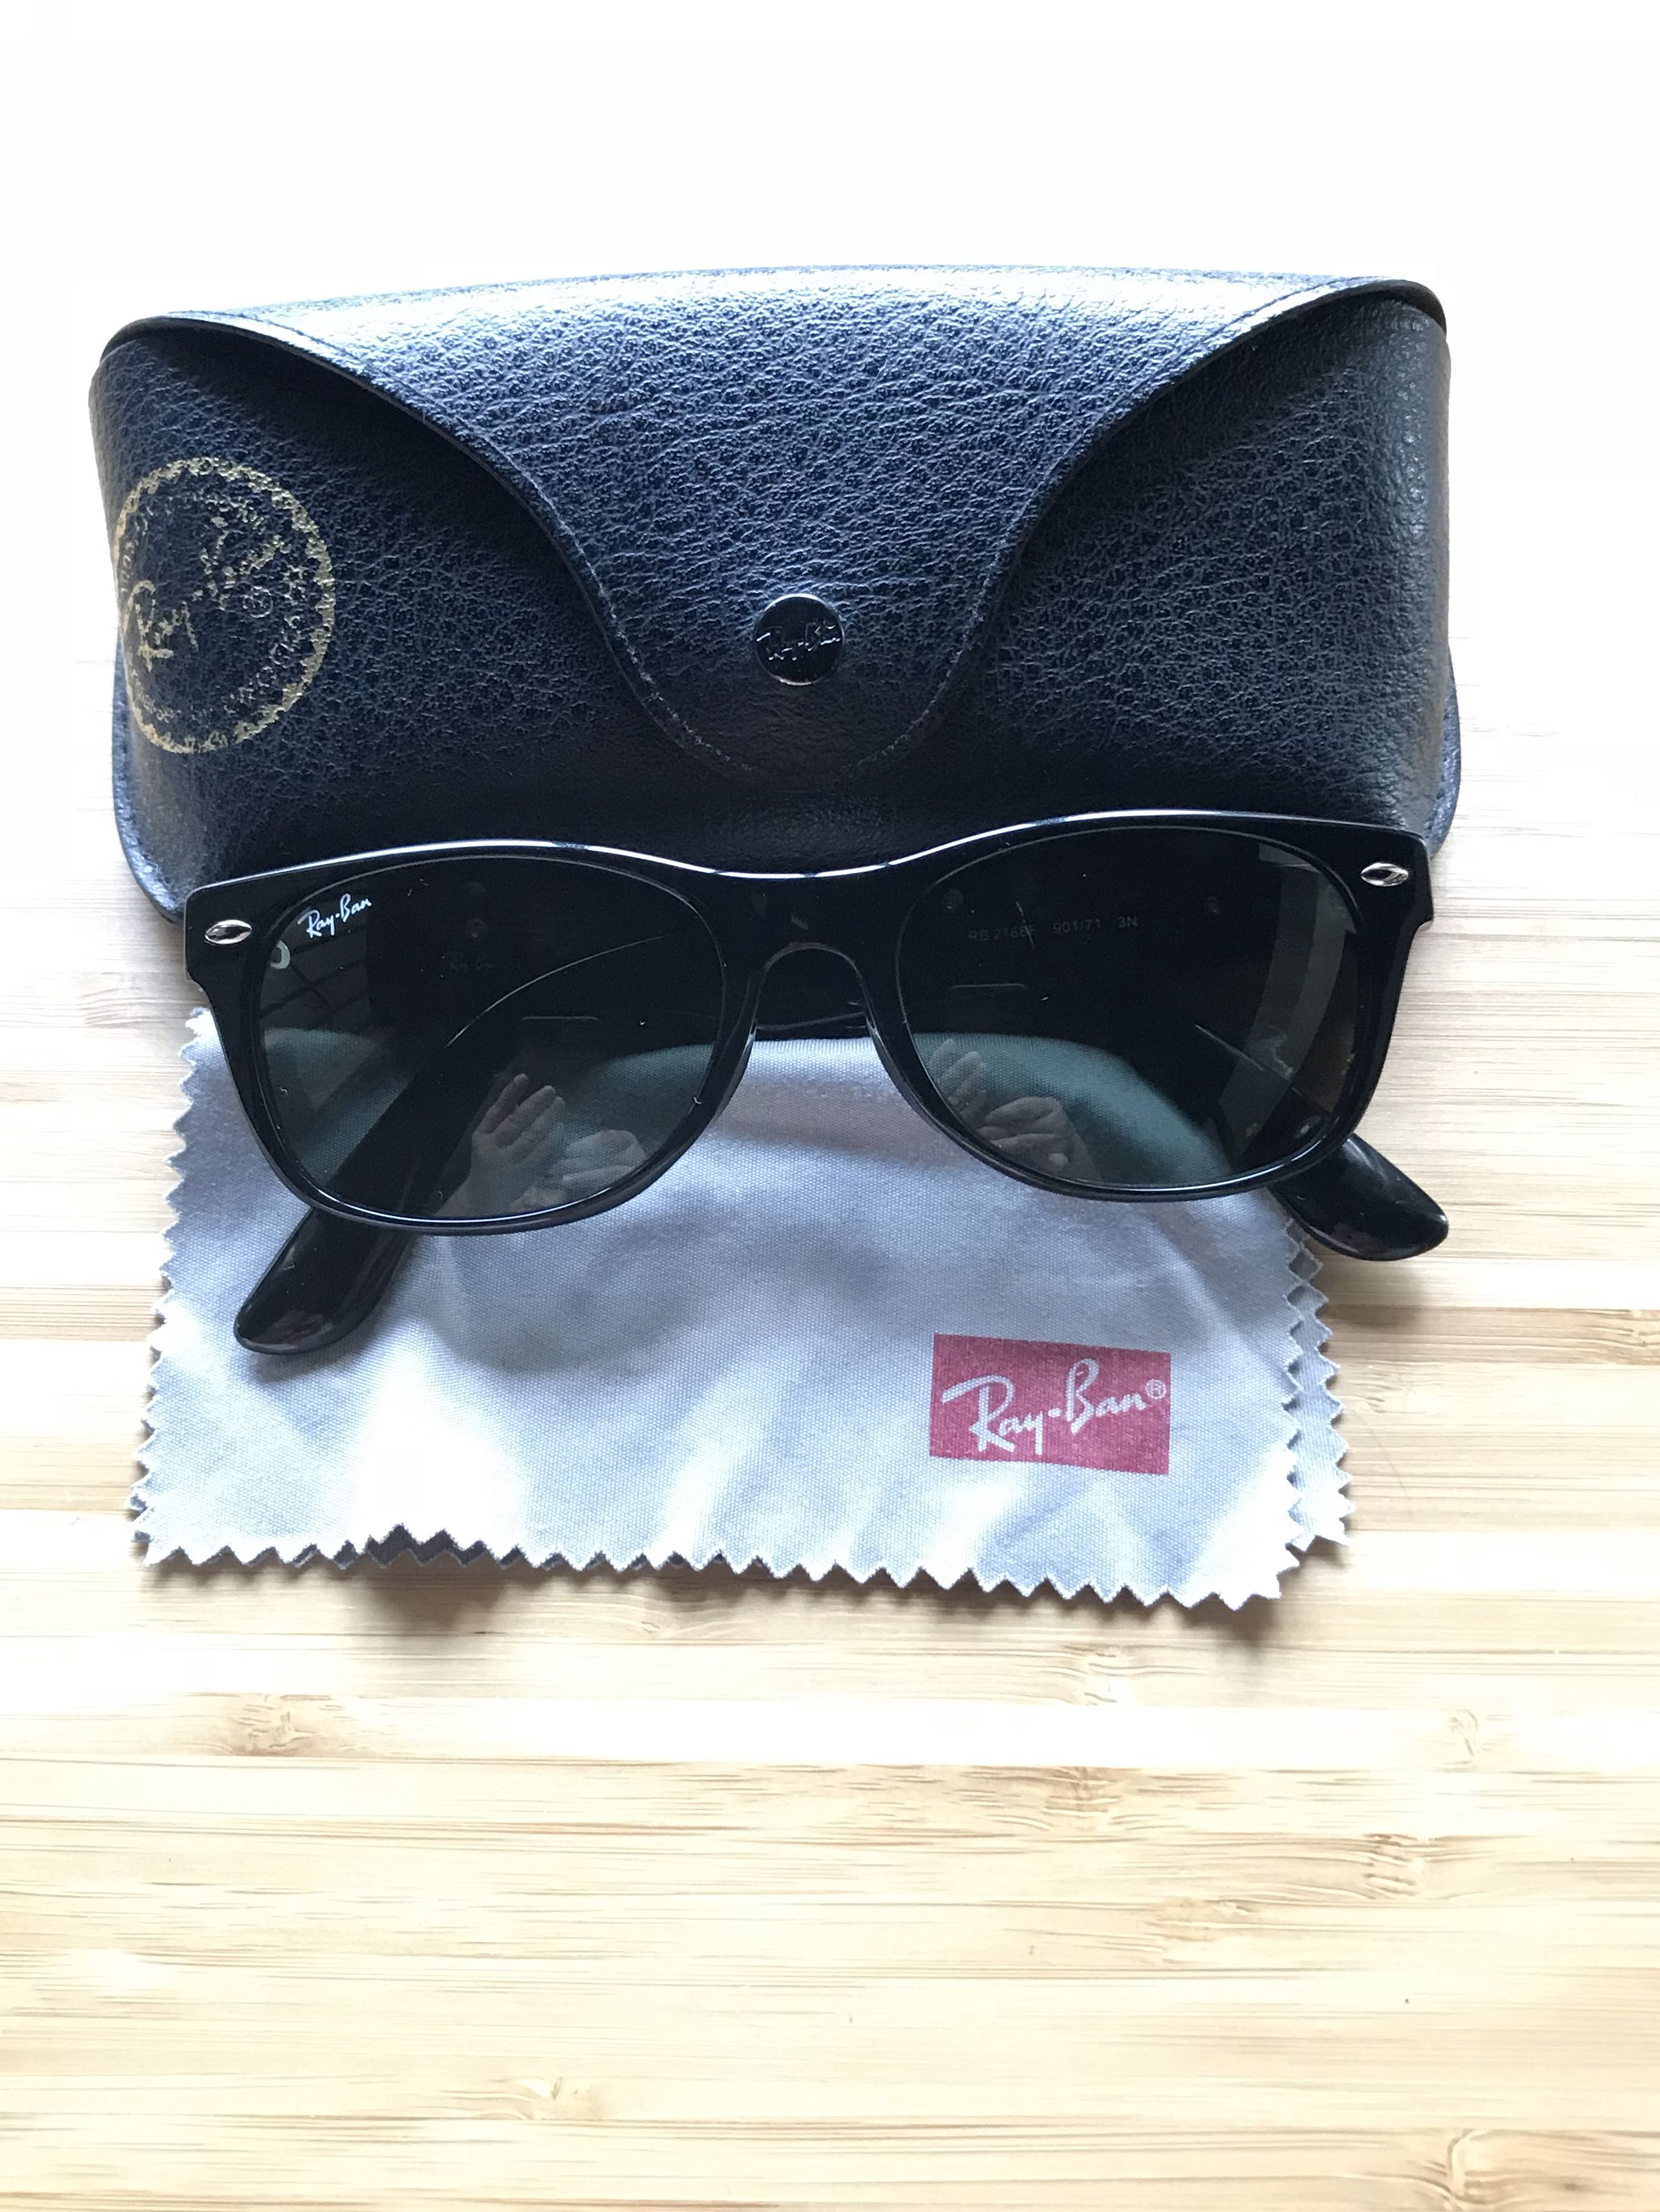 Rayban Wayfarer, Women s Fashion, Accessories, Eyewear   Sunglasses on  Carousell 0754b0b0c6